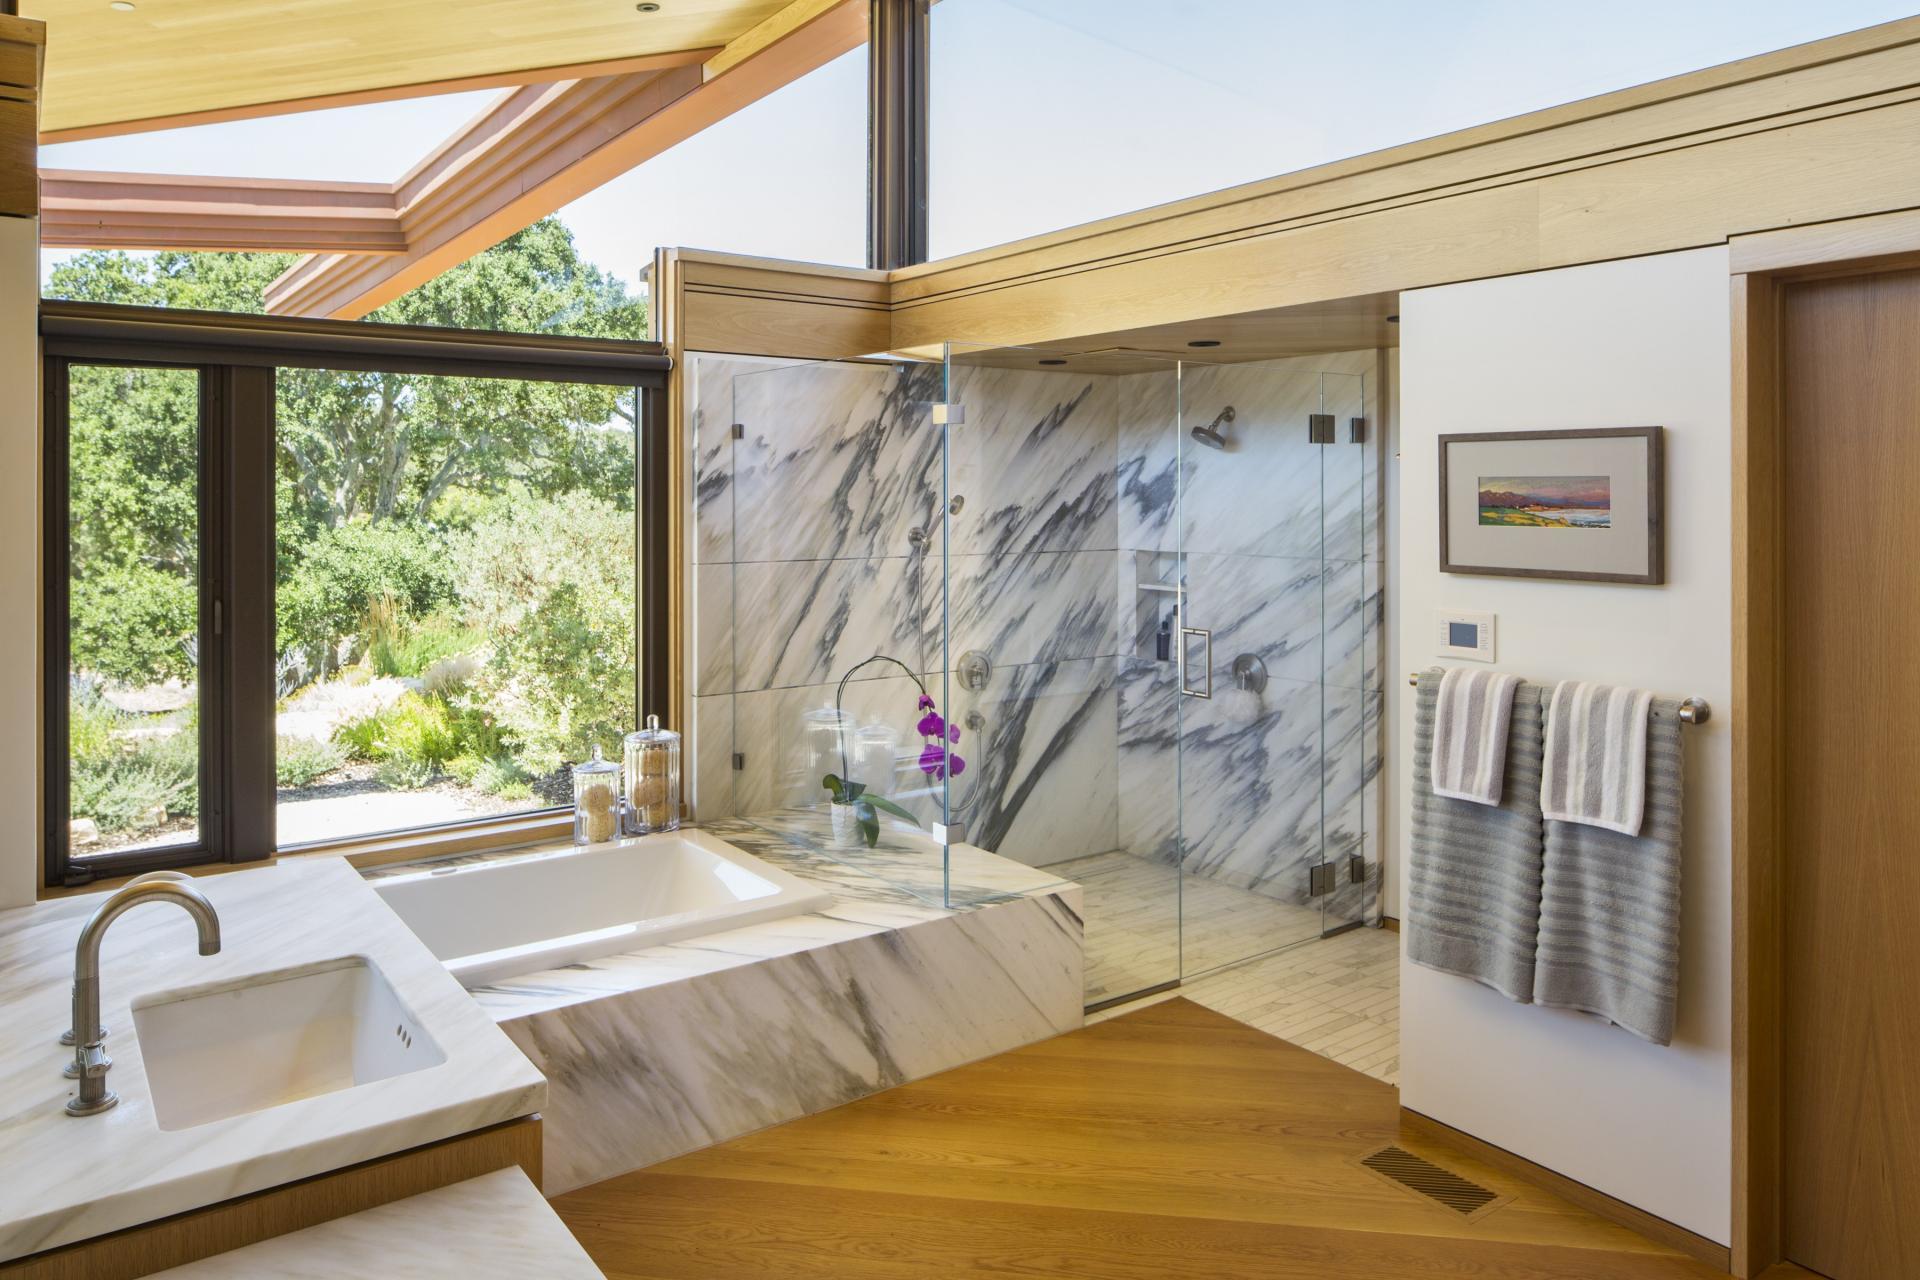 Spacious marble bathroom